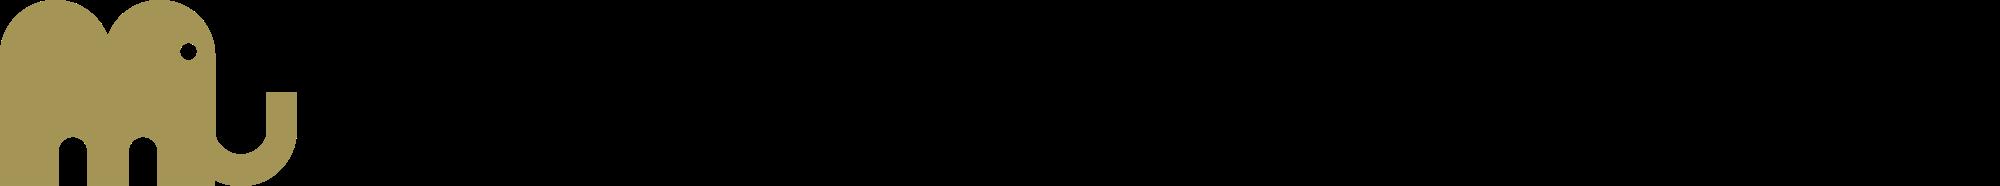 Mammoth Screen